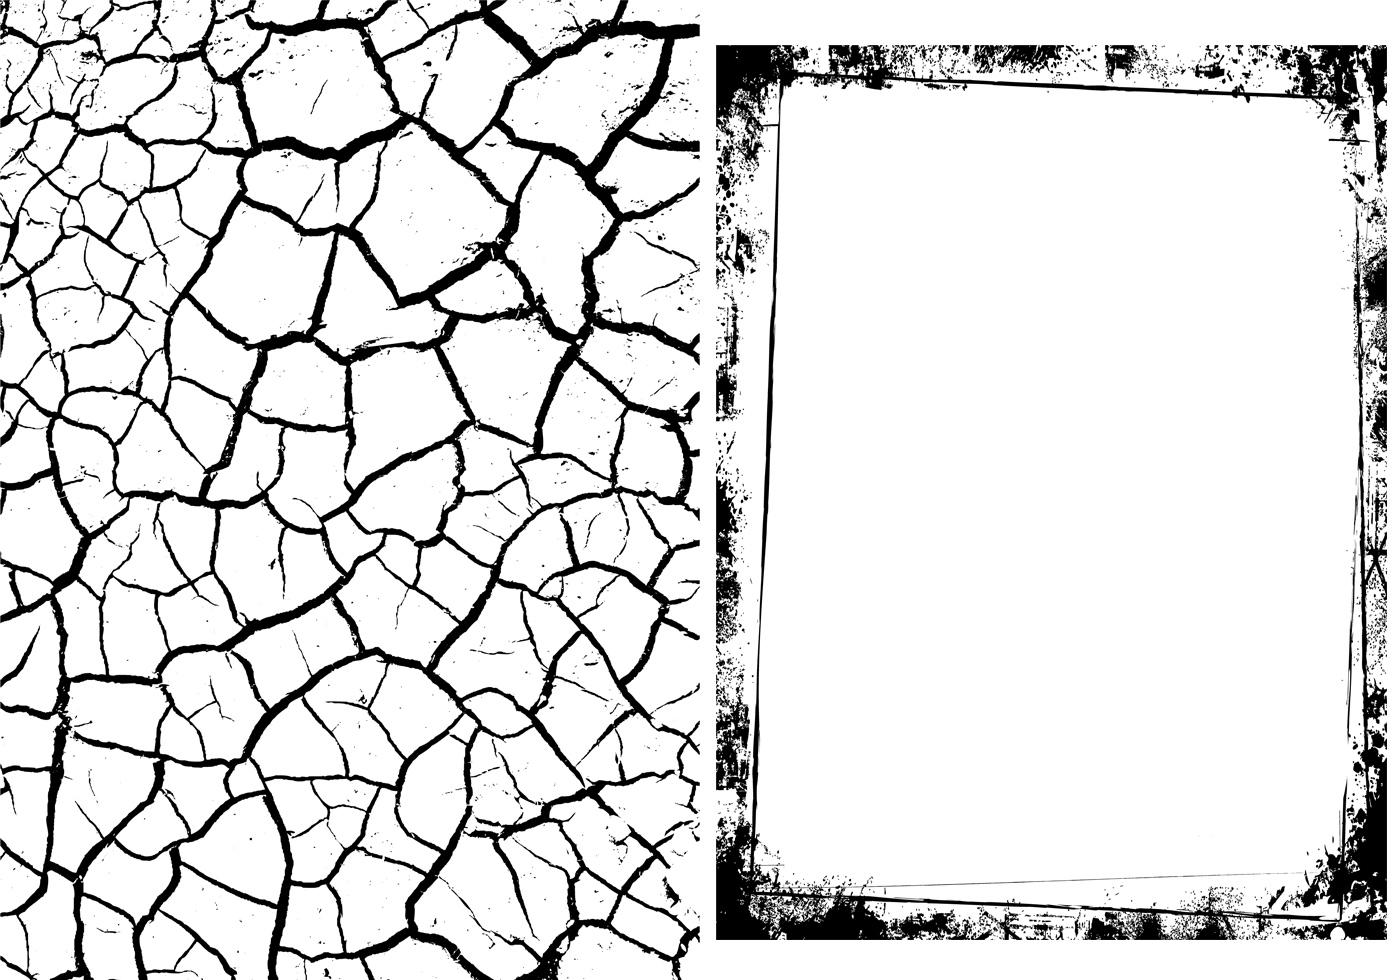 Free Grungy Textures Free Photoshop Brushes At Brusheezy